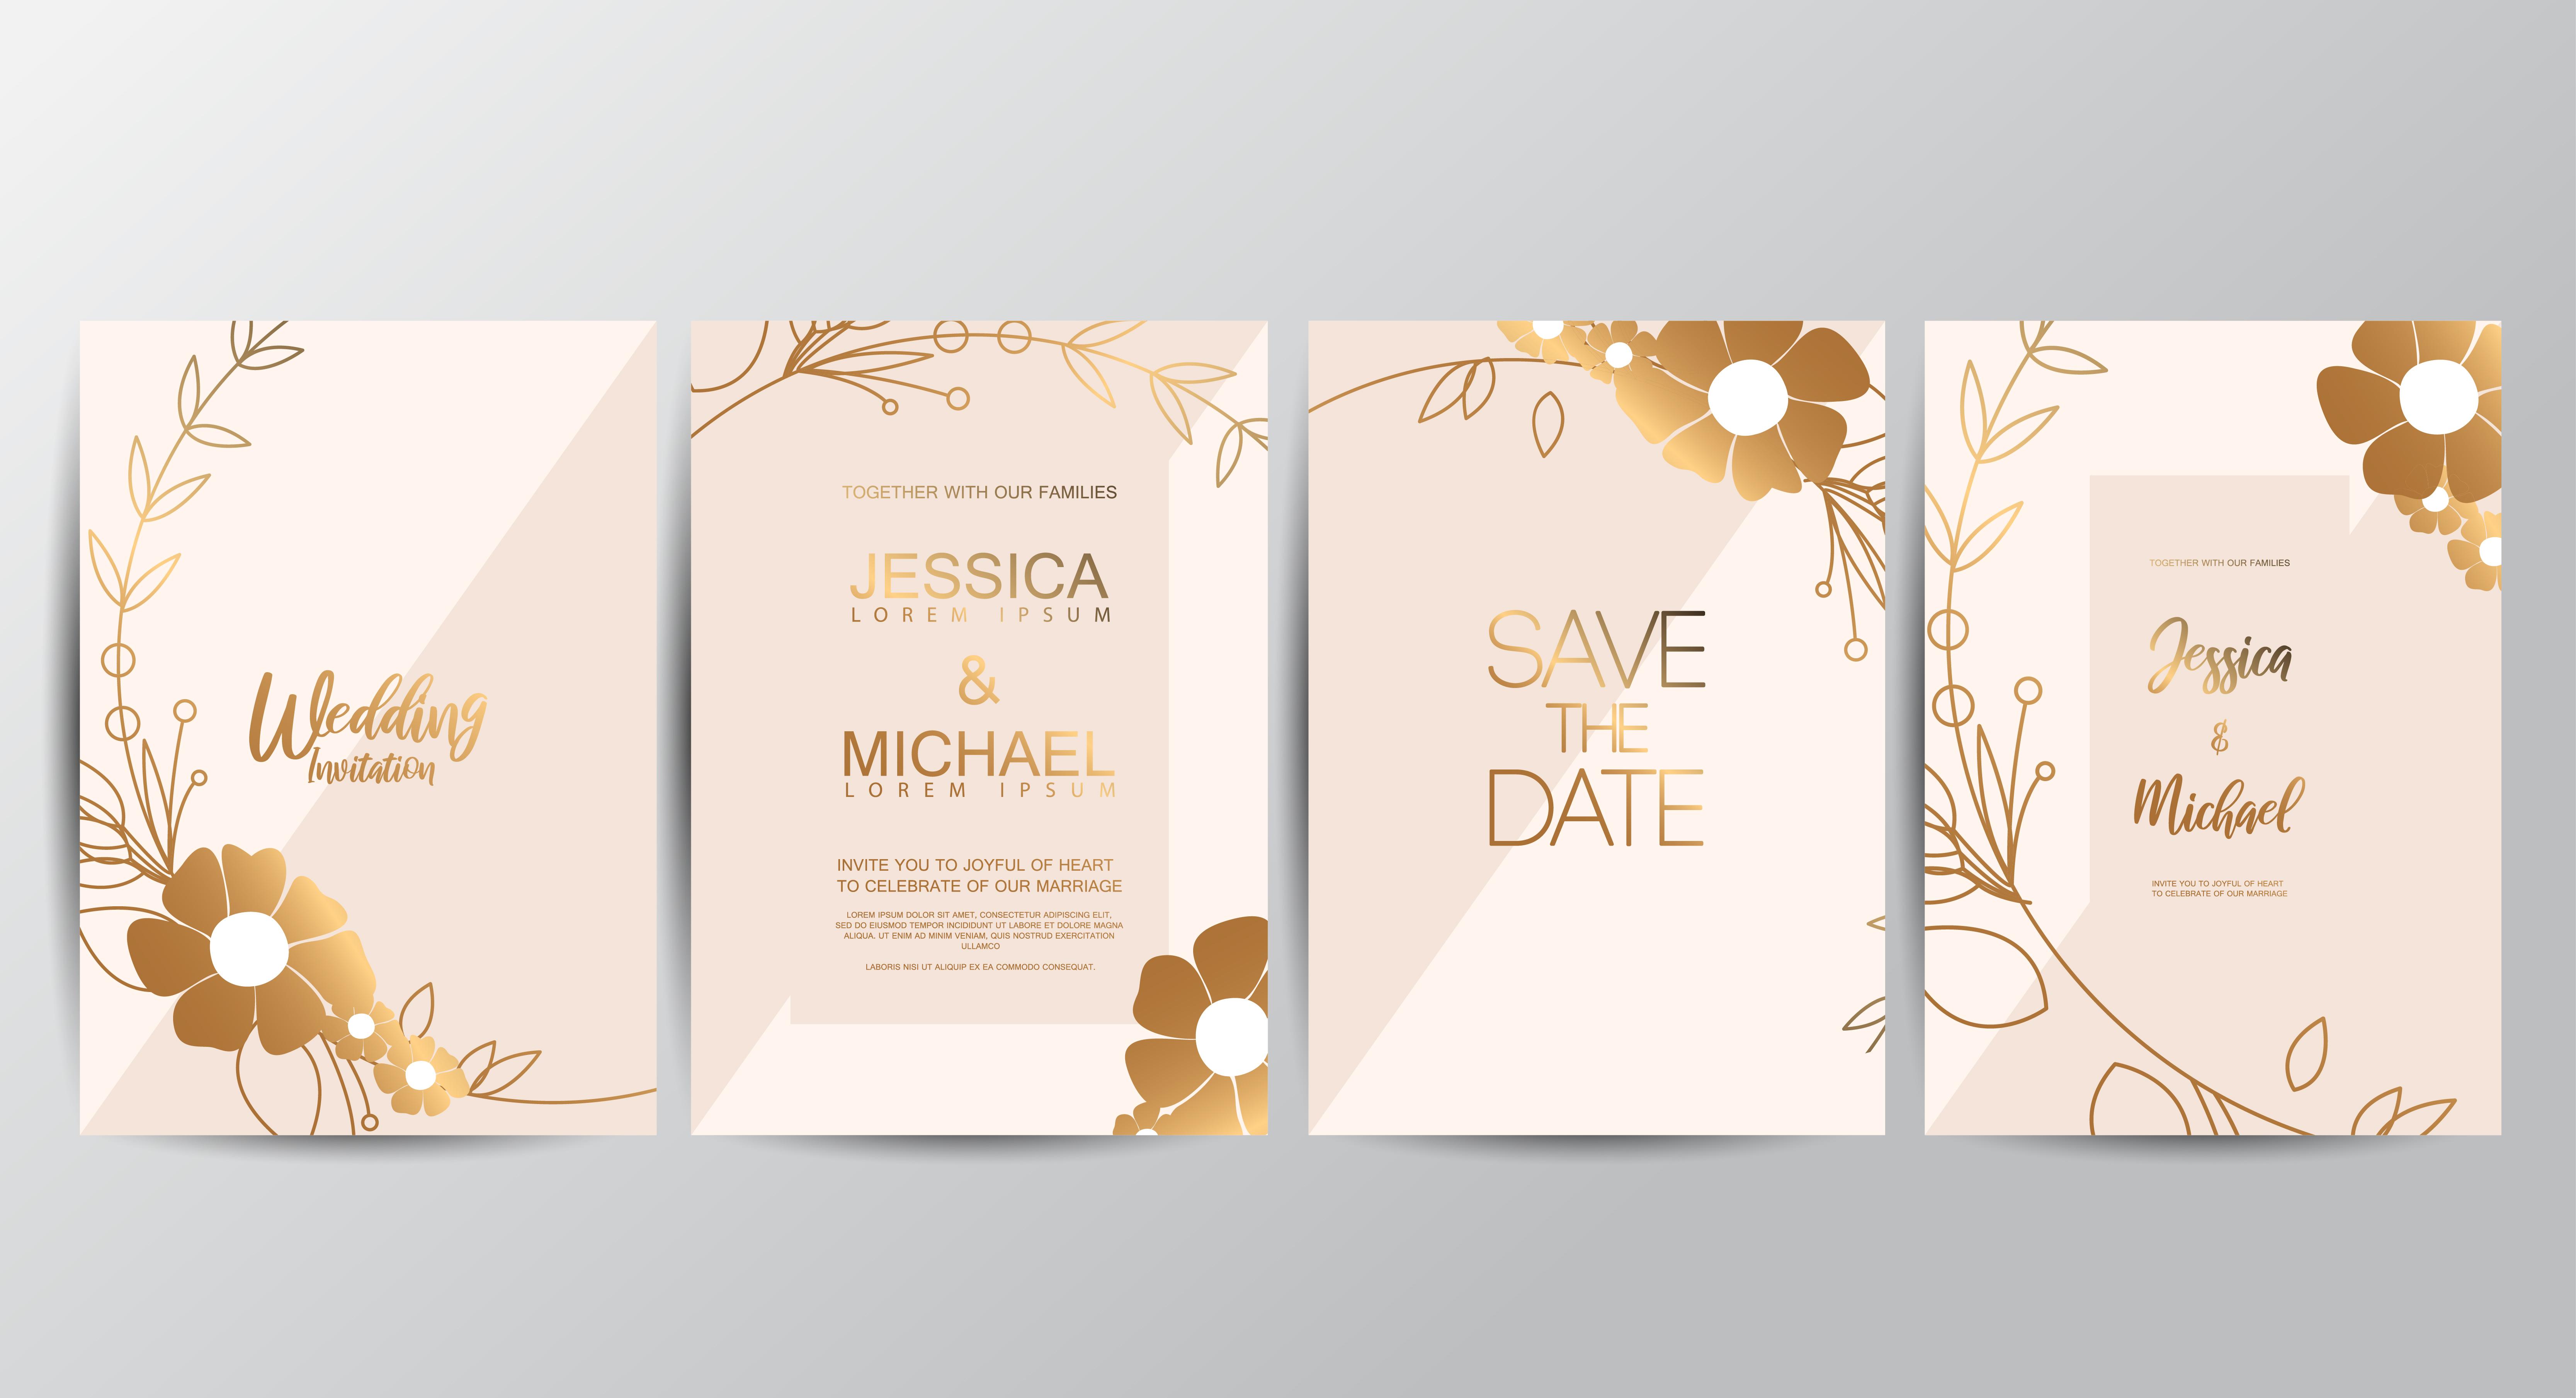 Premium luxury wedding invitation cards - Download Free Vectors, Clipart  Graphics & Vector Art